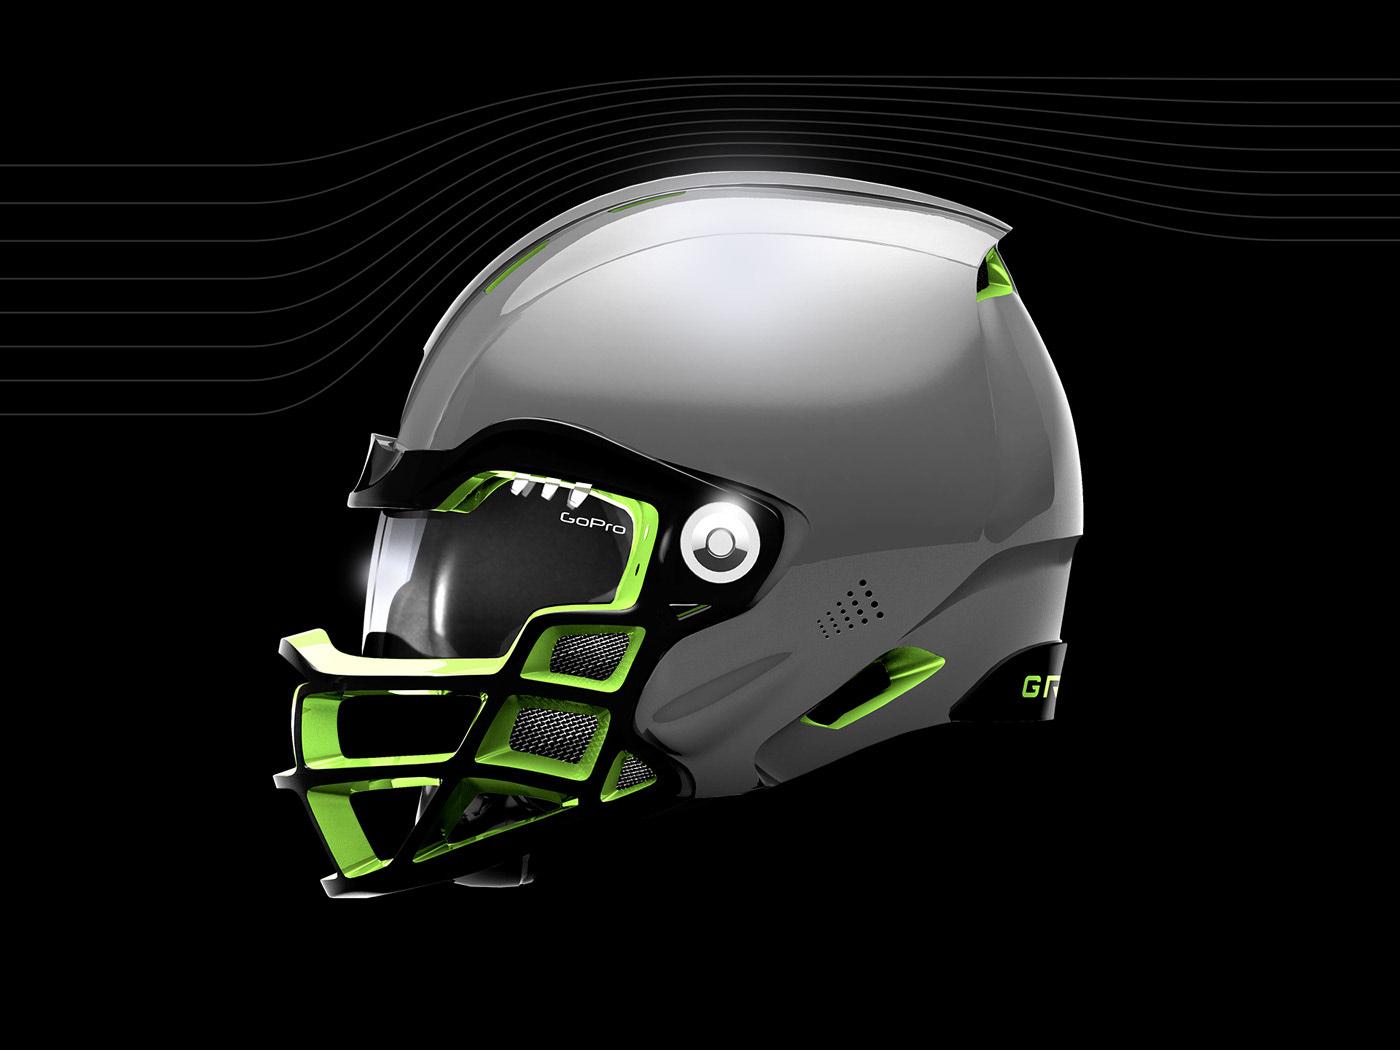 How To Paint A Football Helmet Black